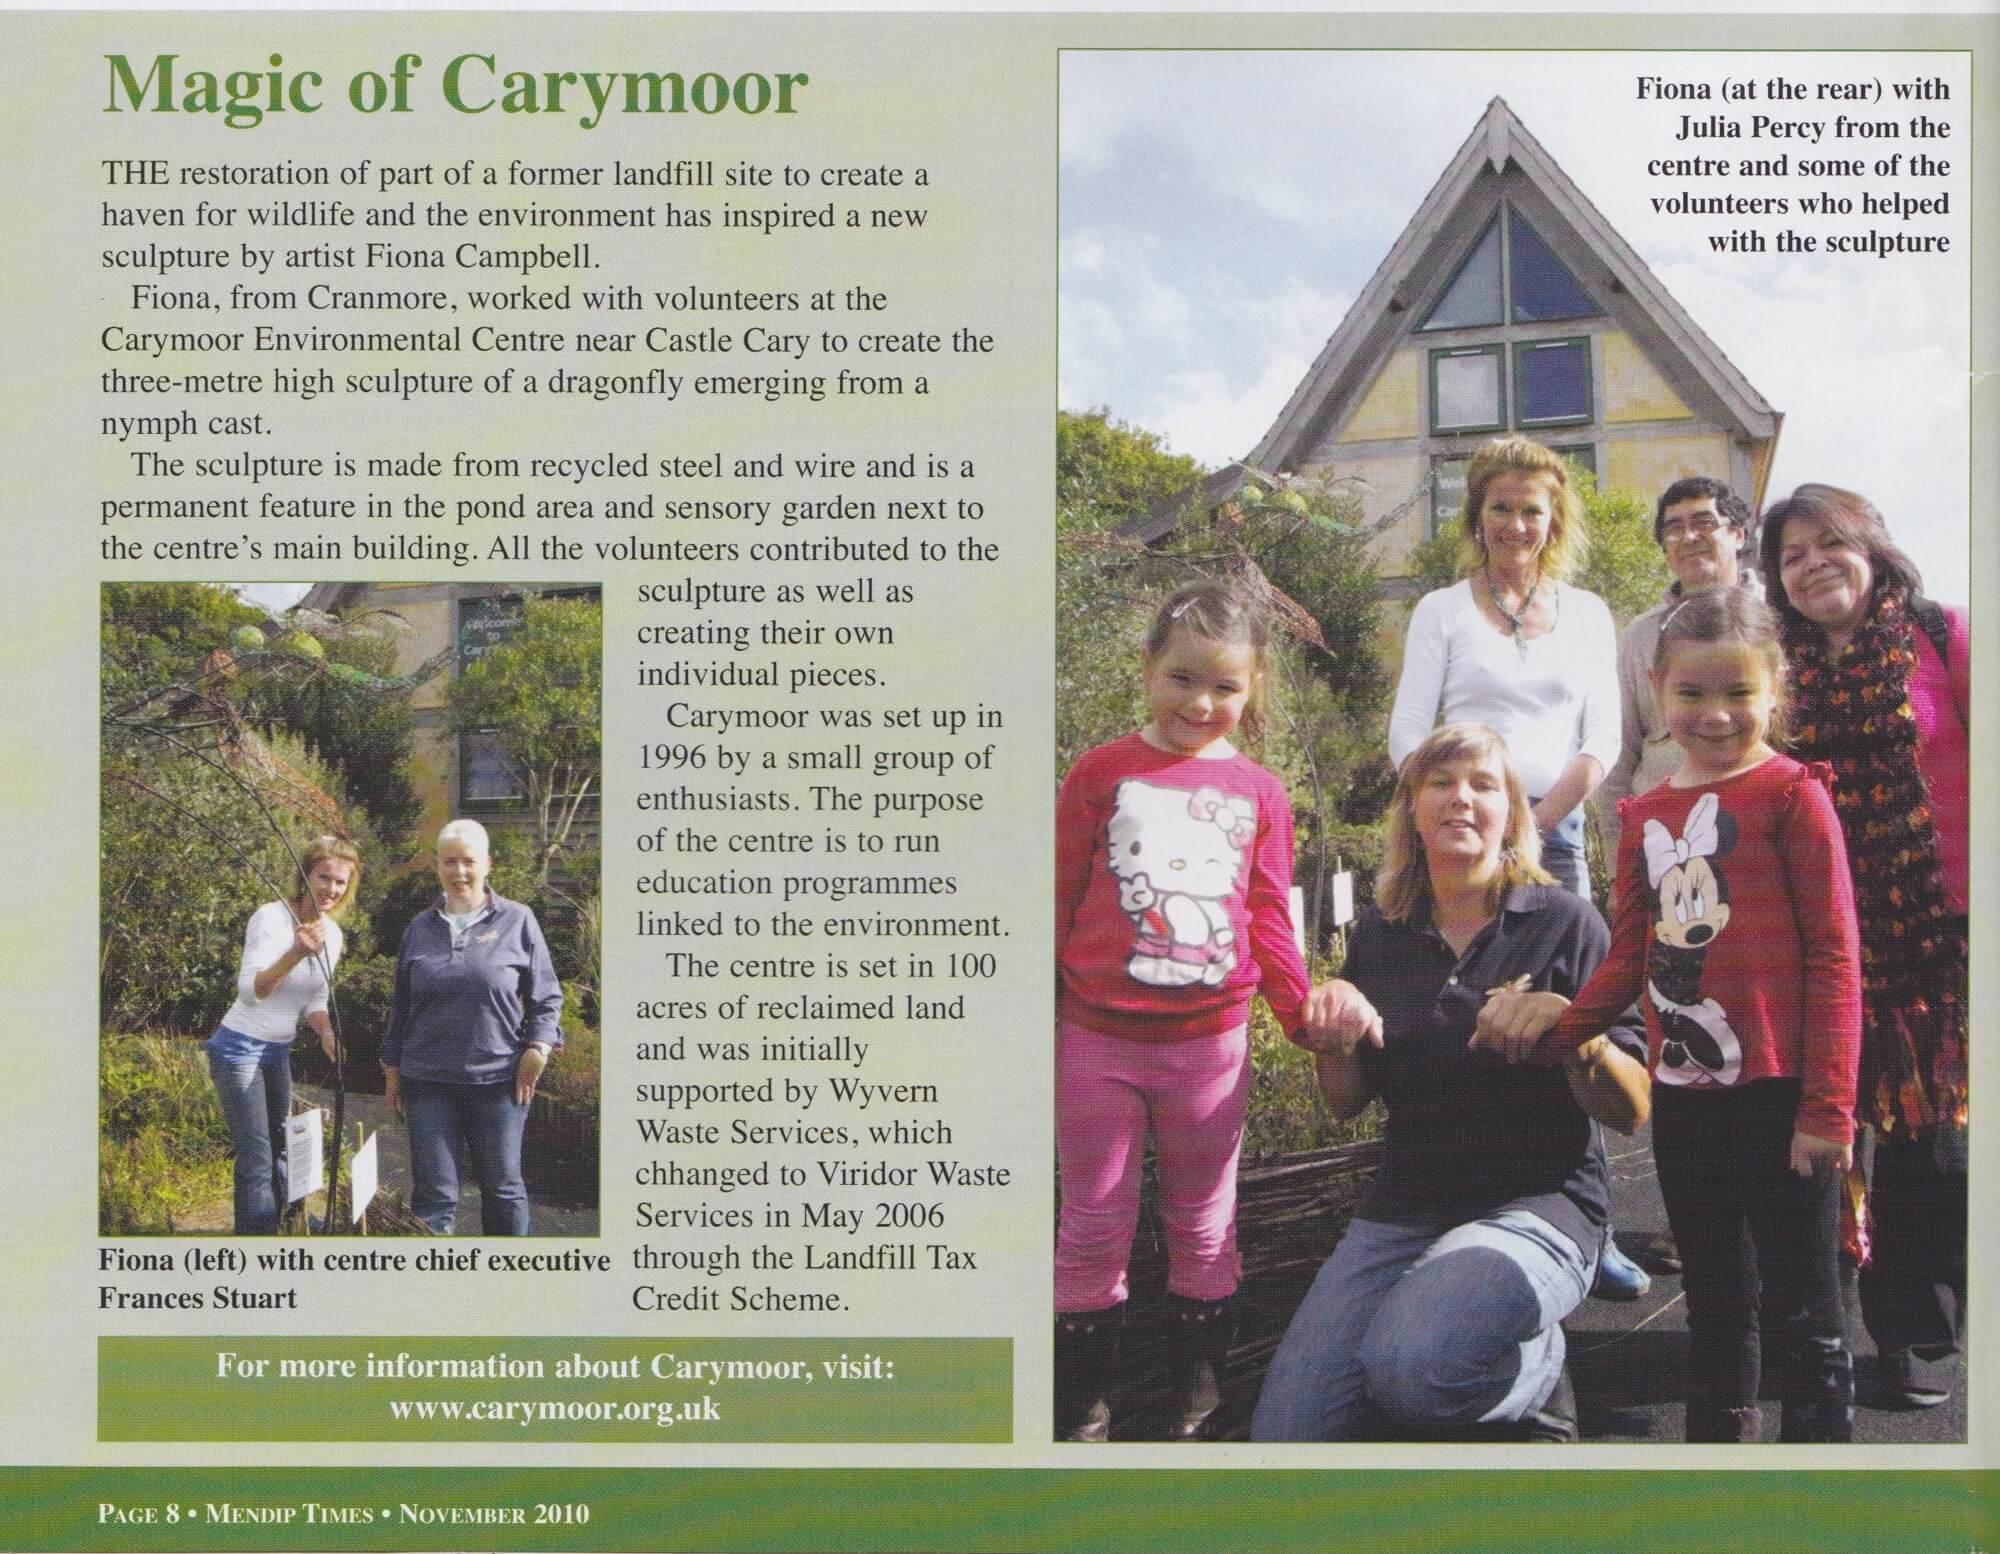 Mendip Times - Carymoor Environmental Sculpture Project